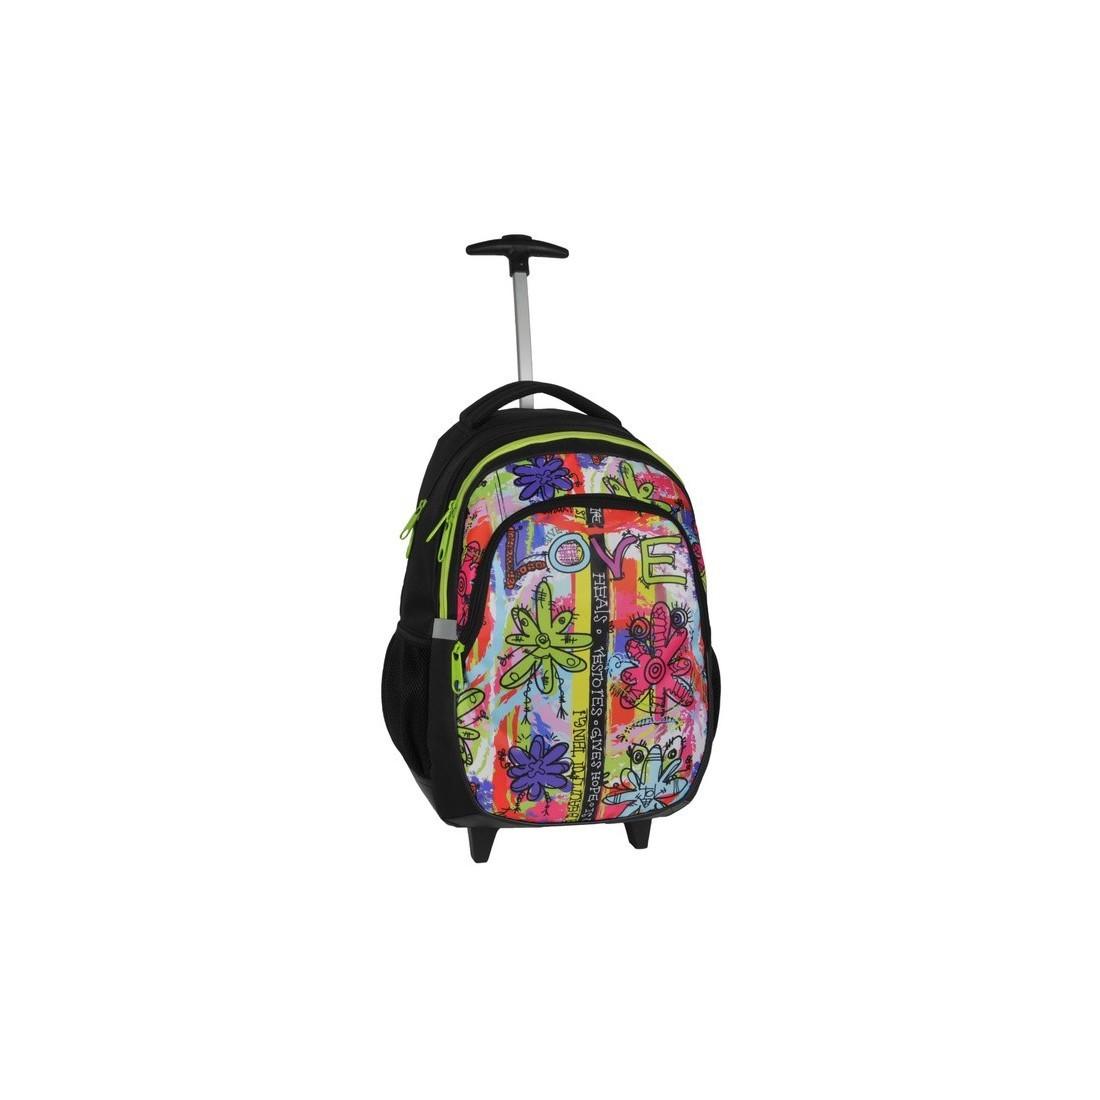 Plecak na kółkach Dream Big Love w kolorowe kwiatki - plecak-tornister.pl